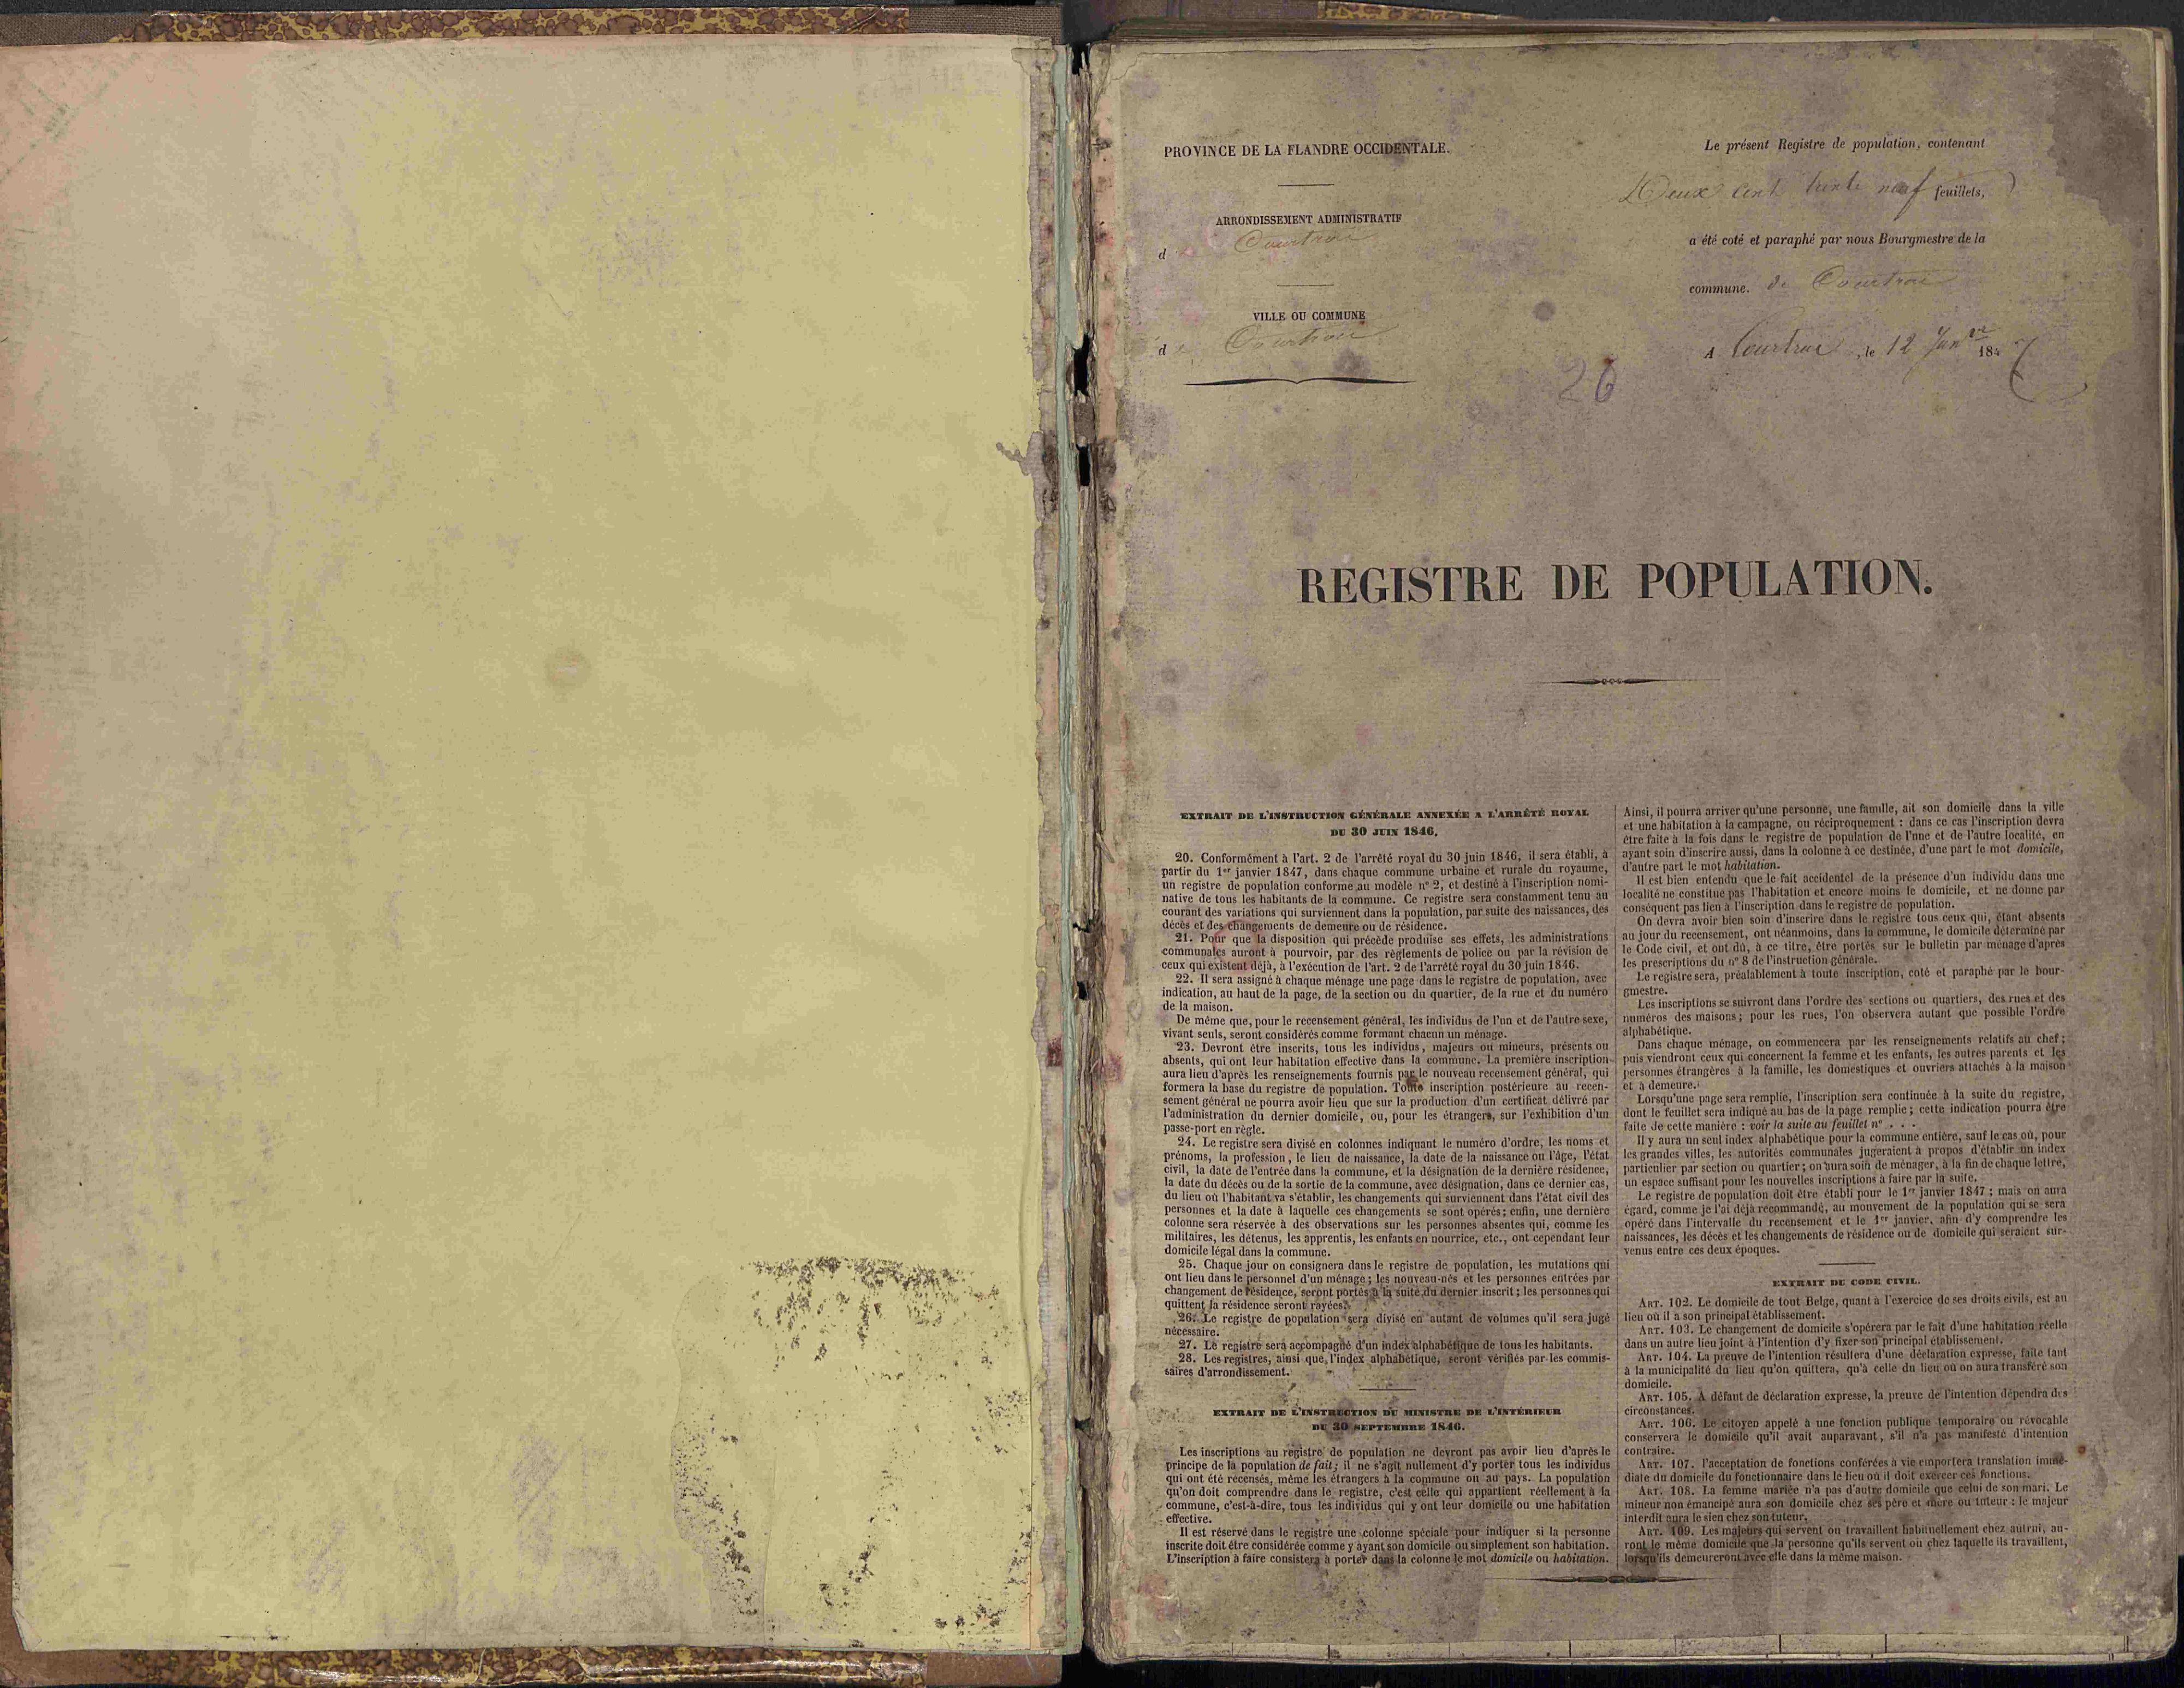 Bevolkingsregister Kortrijk 1846 boek 26